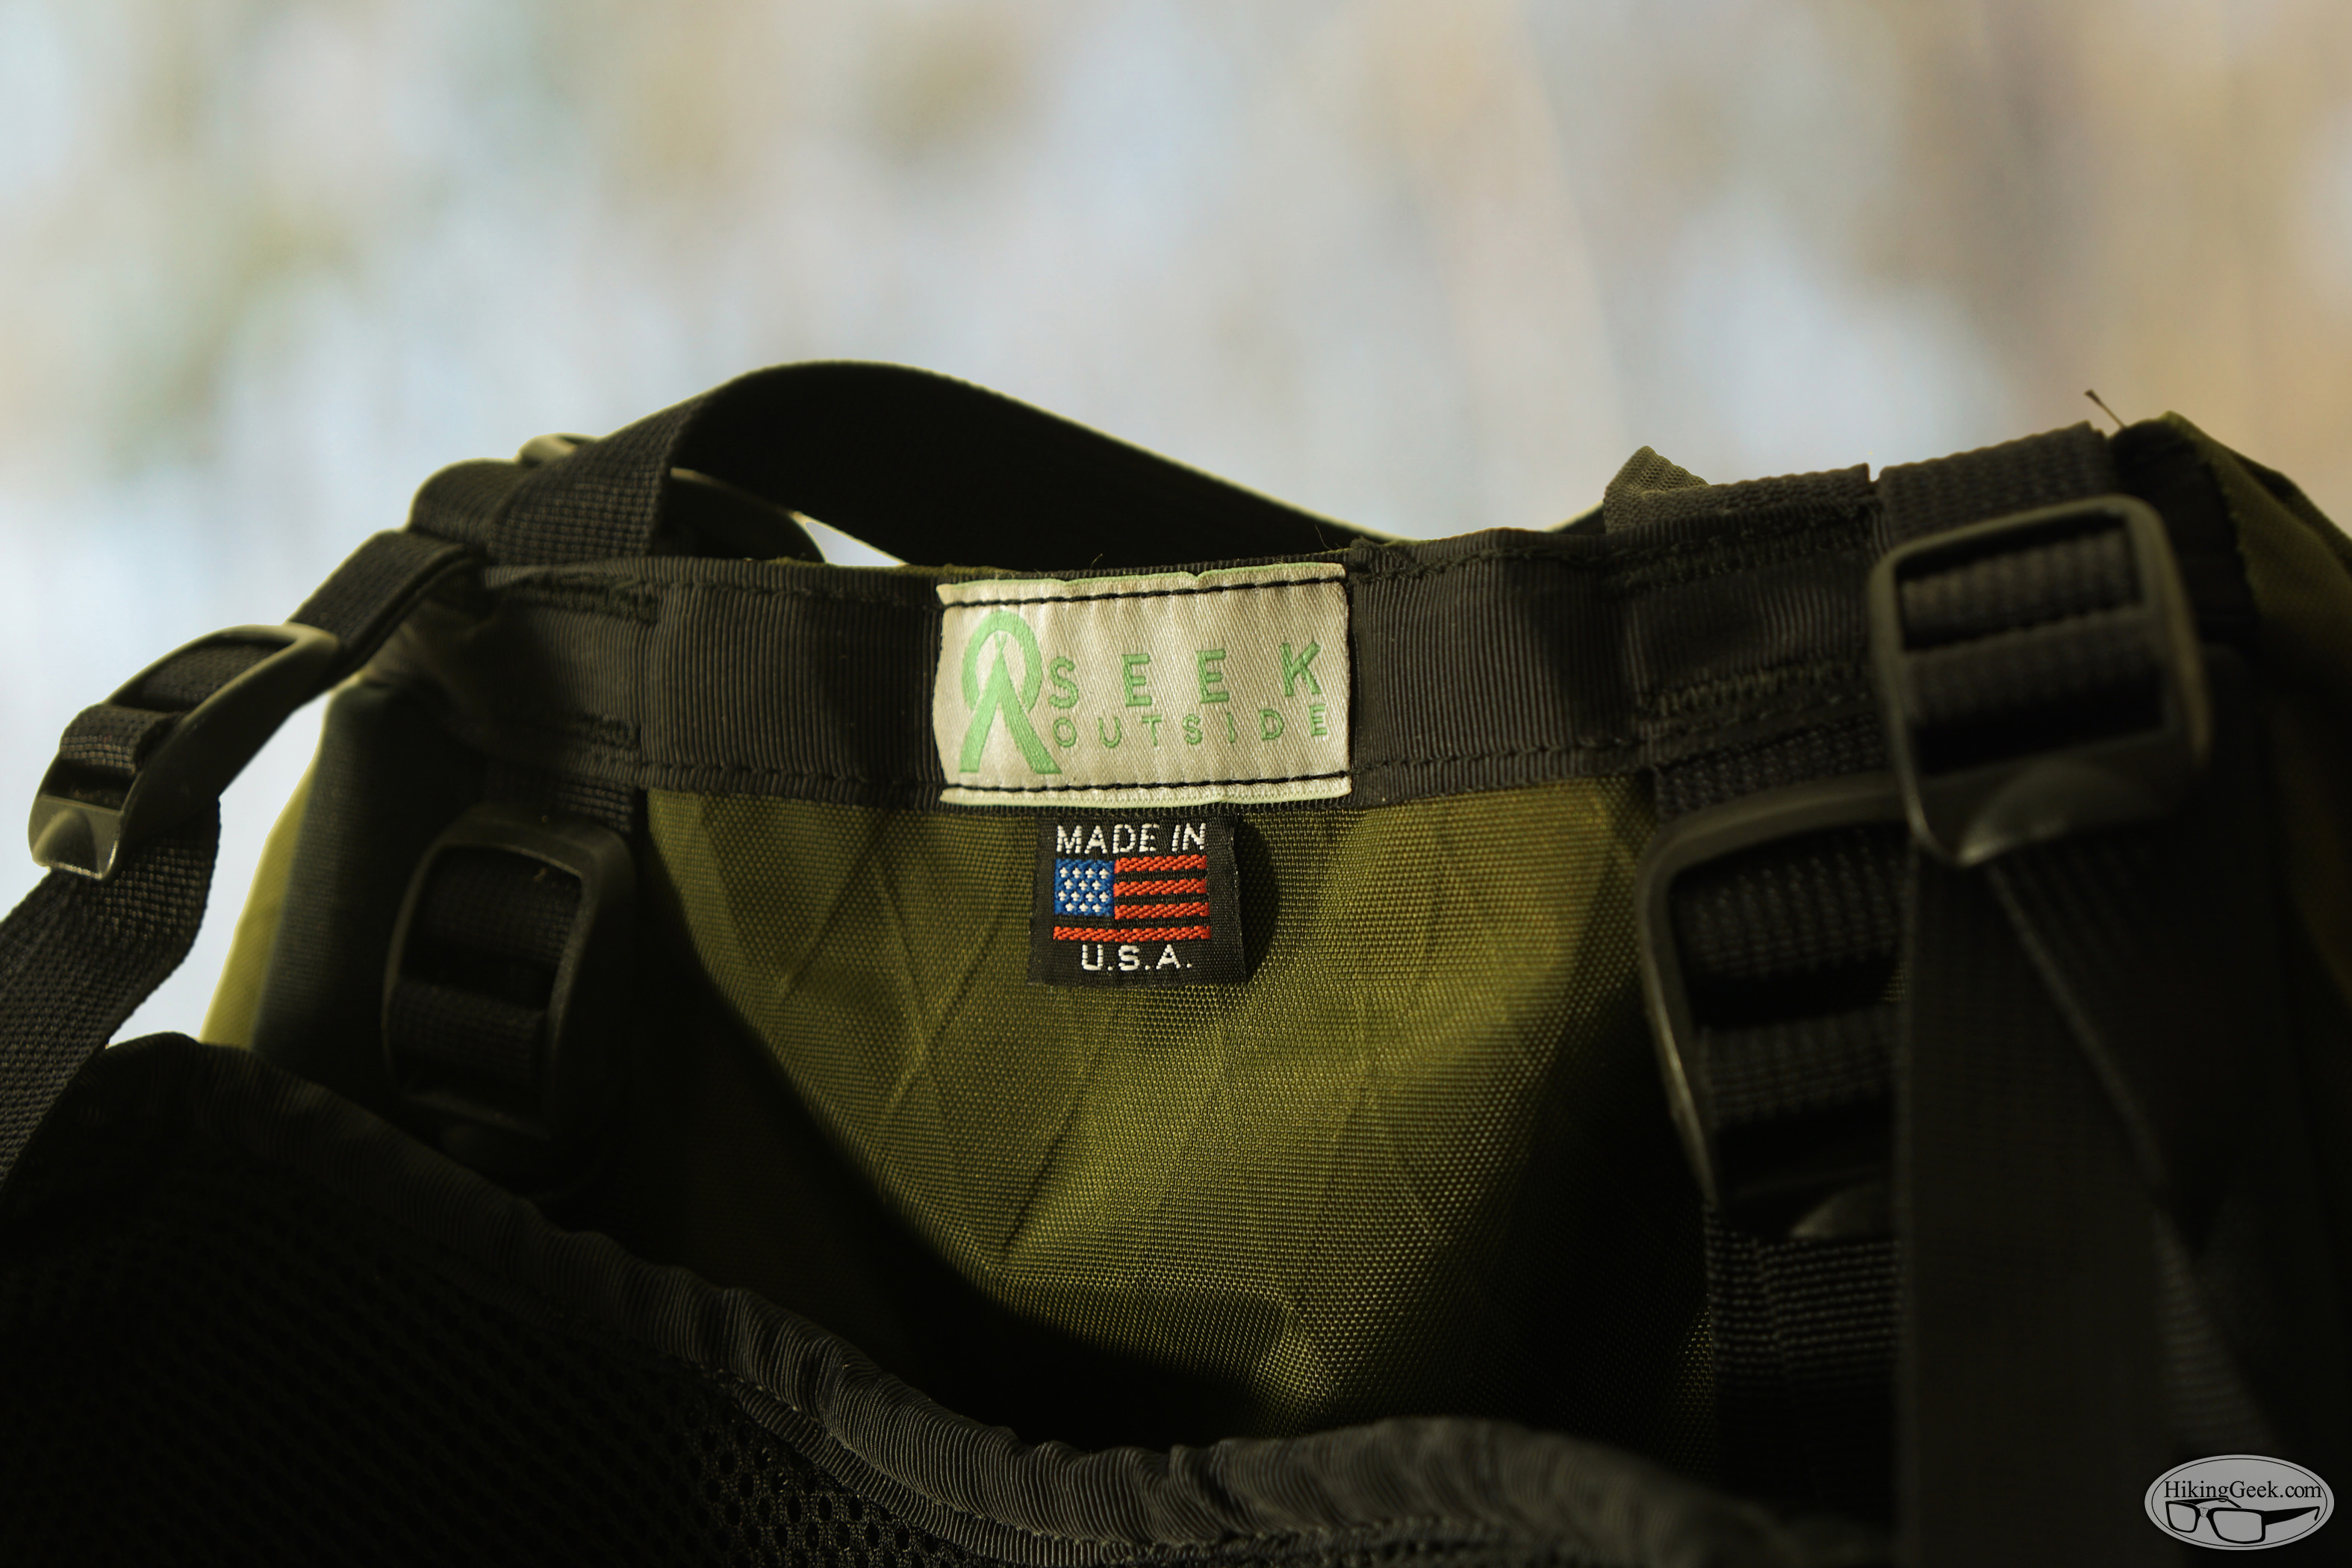 Gear Review: Seek Outside Divide 4500 Ultralight External Frame Backpack